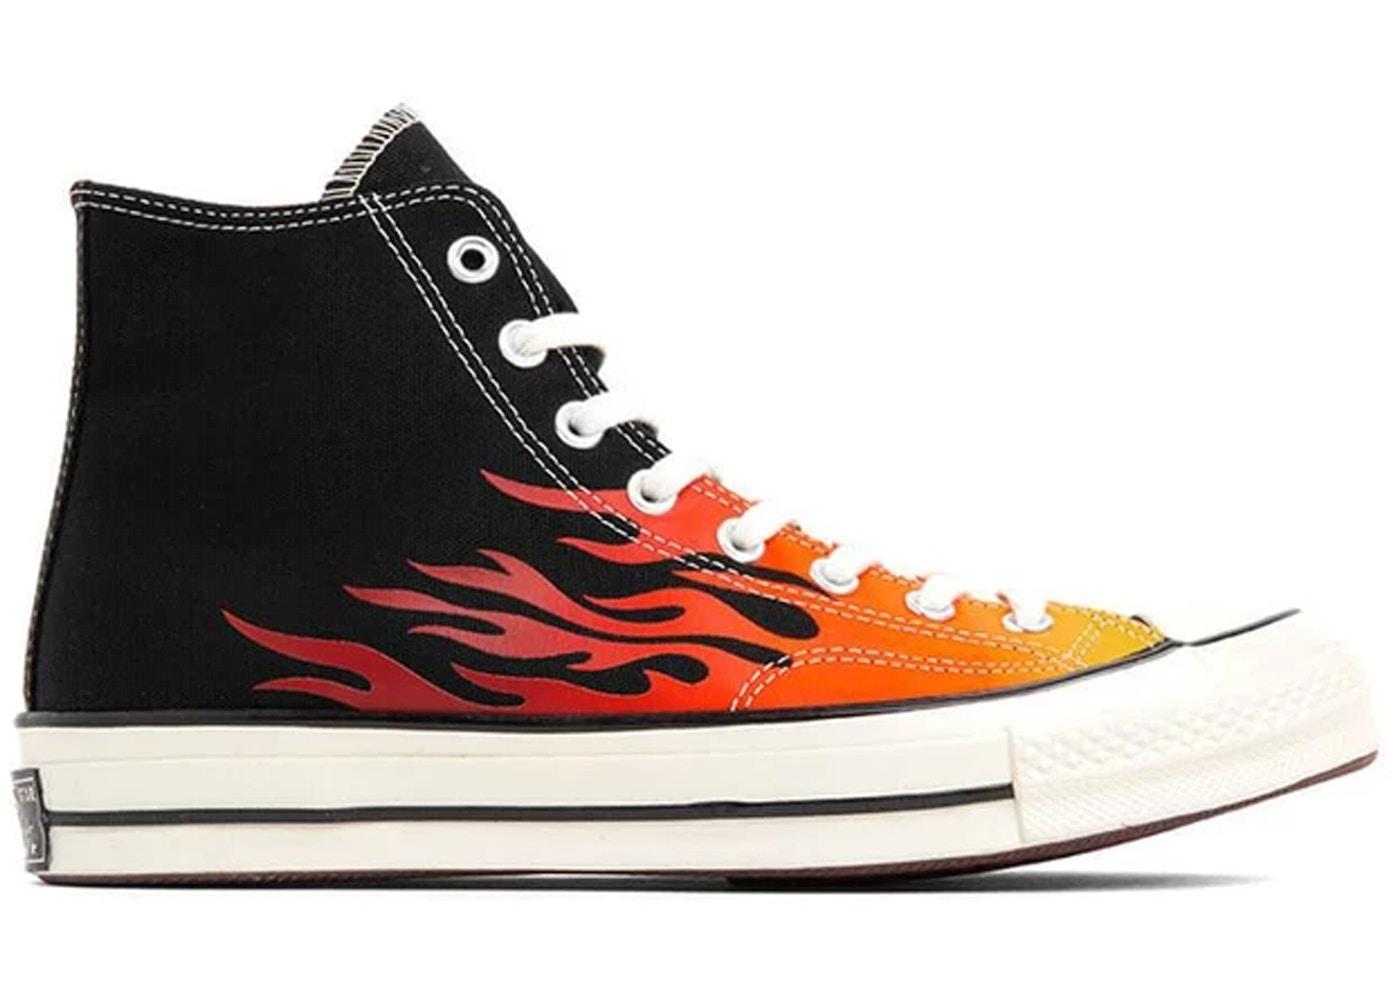 Converse Chuck Taylor All Star 70s Hi Archive Print Flames